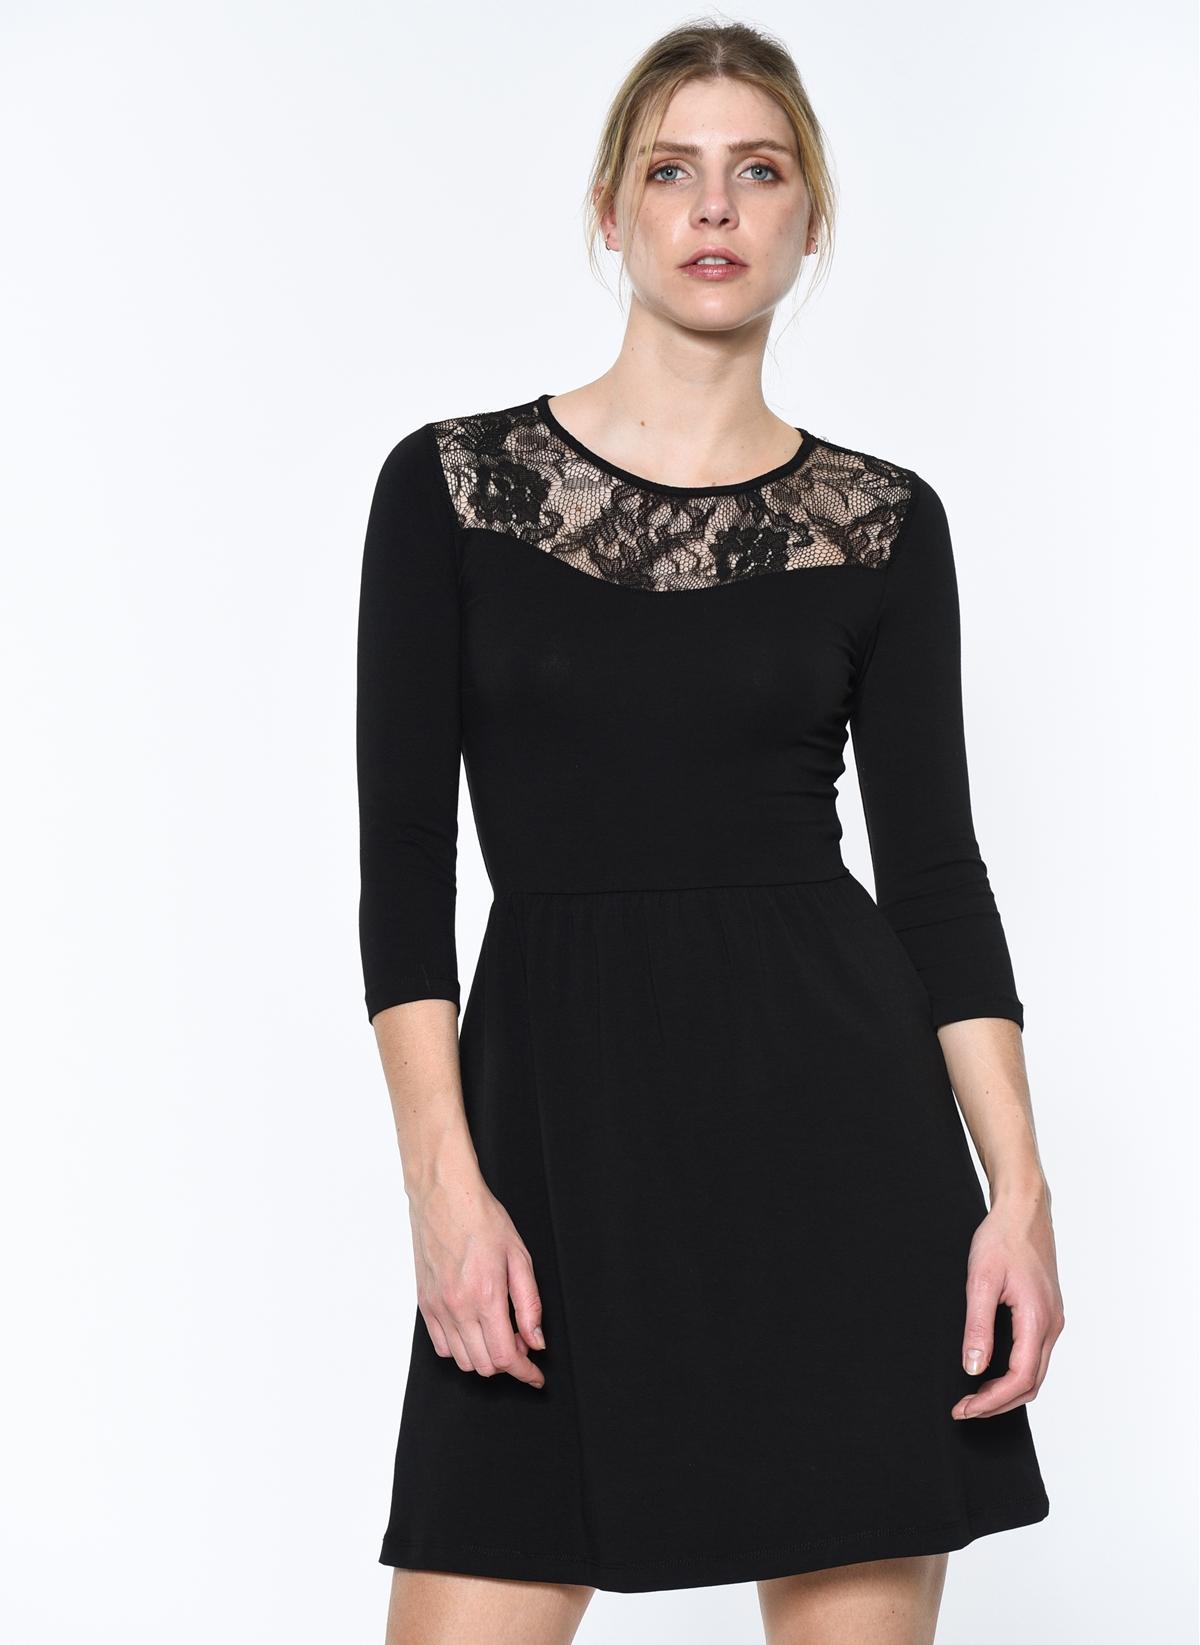 8be6fa46fef61 Only Kadın Elbise Siyah - Glami.com.tr